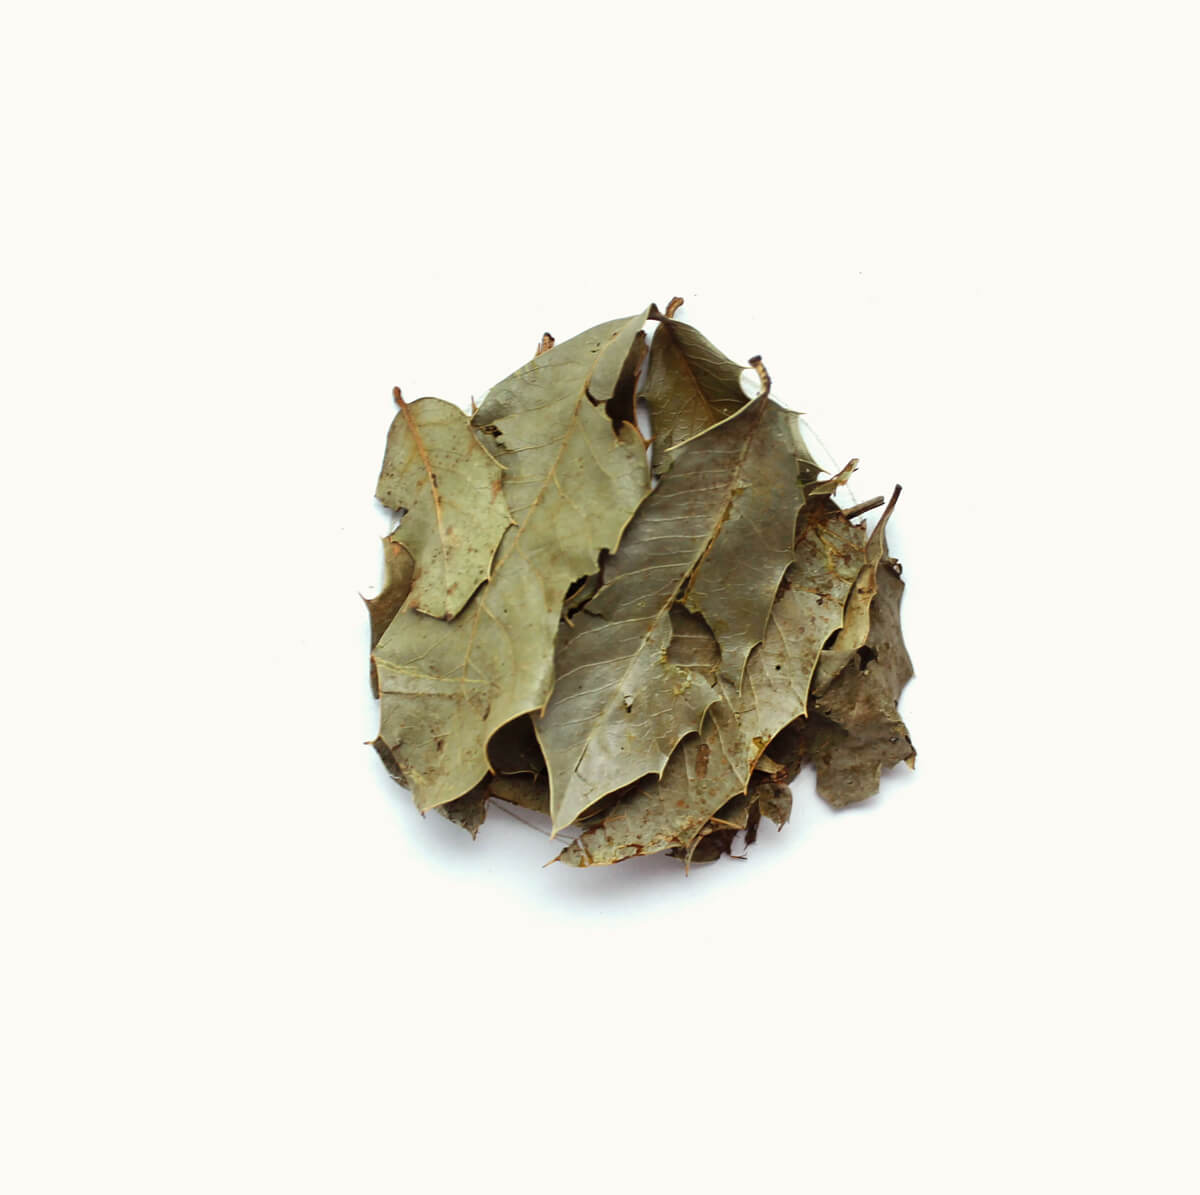 ESPINHEIRA SANTA - Maytenus ilicifolia - 20g